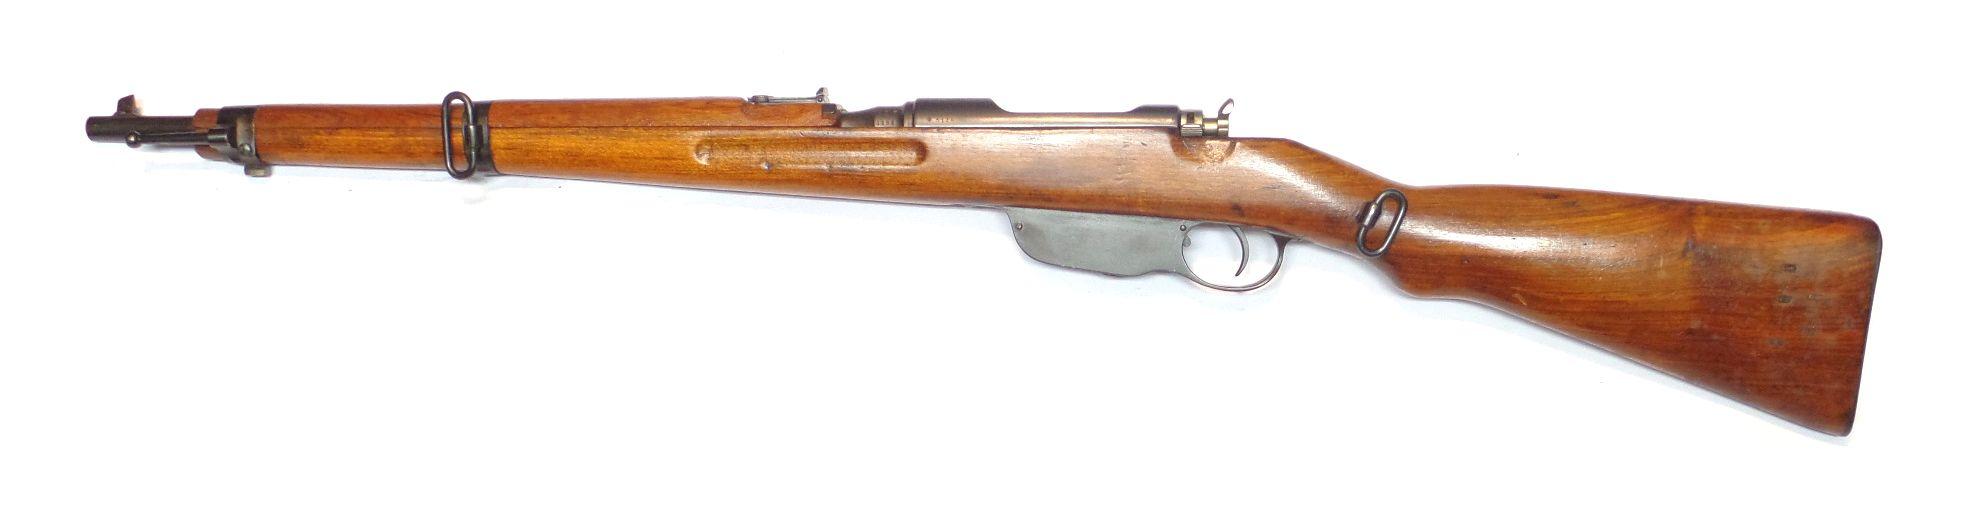 STEYR M95 carabine calibre 8x56R